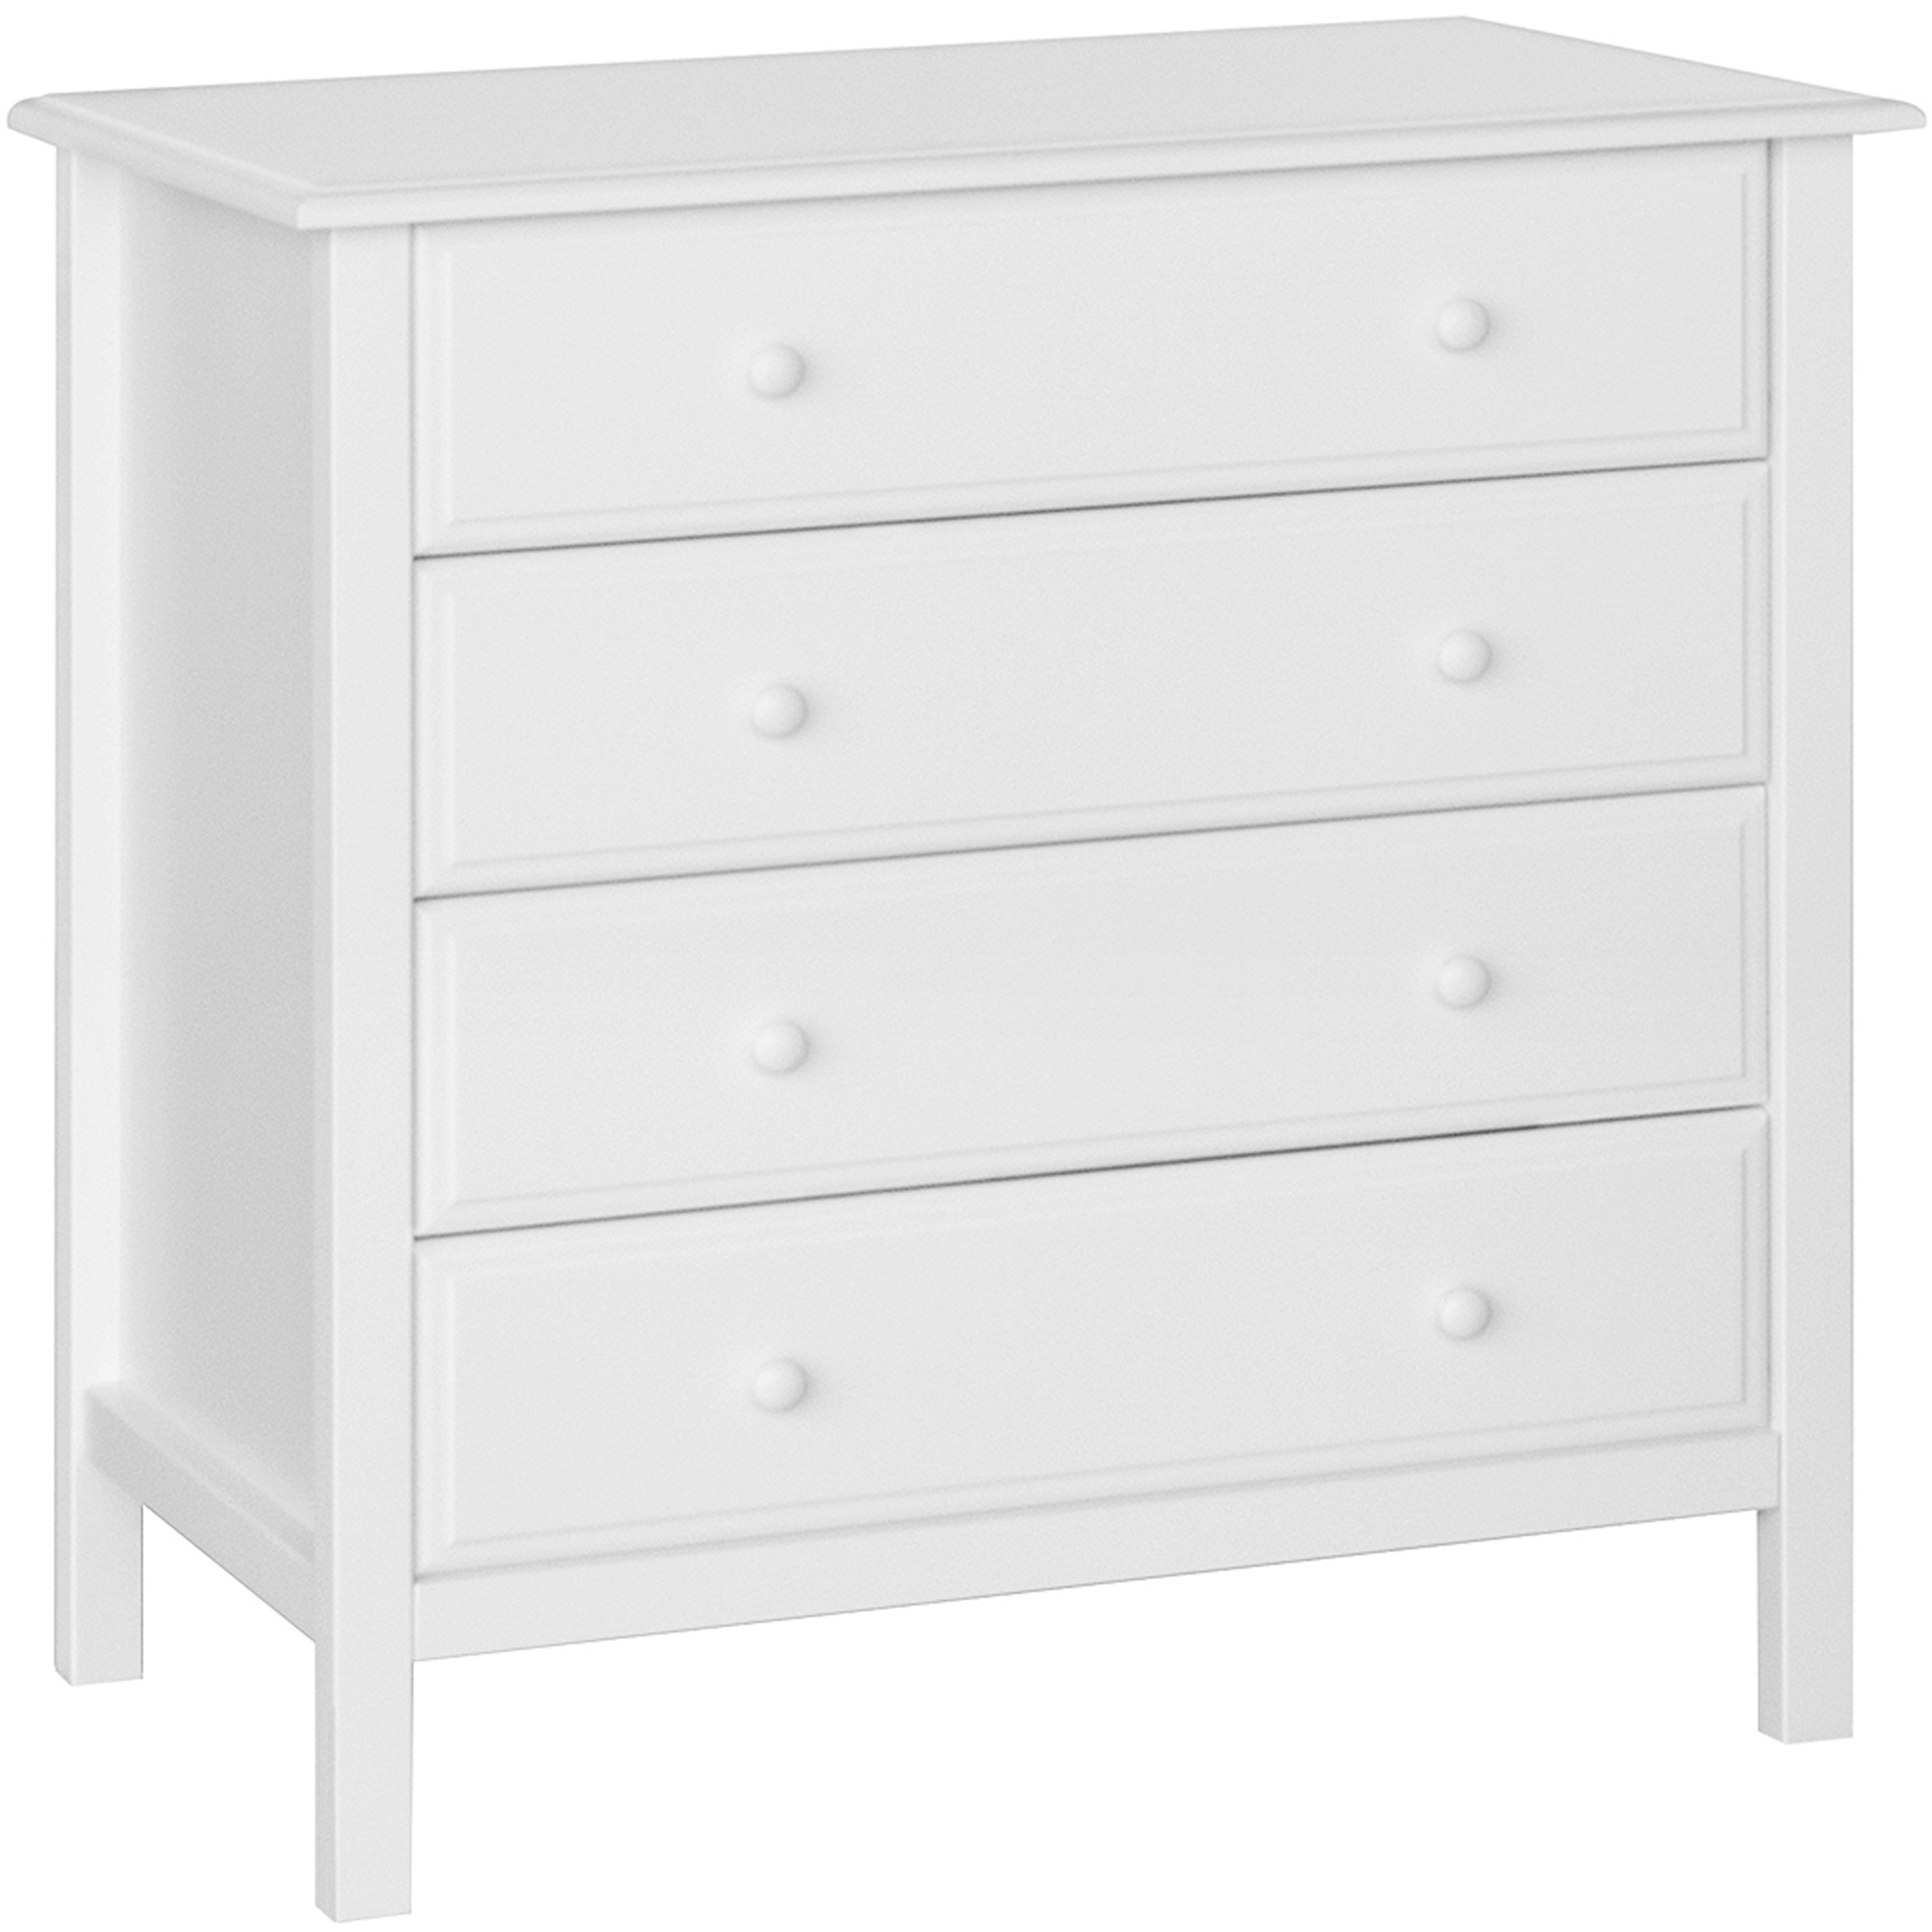 Davinci Kalani Dresser | Da Vinci Kalani Crib | Kalani Crib White